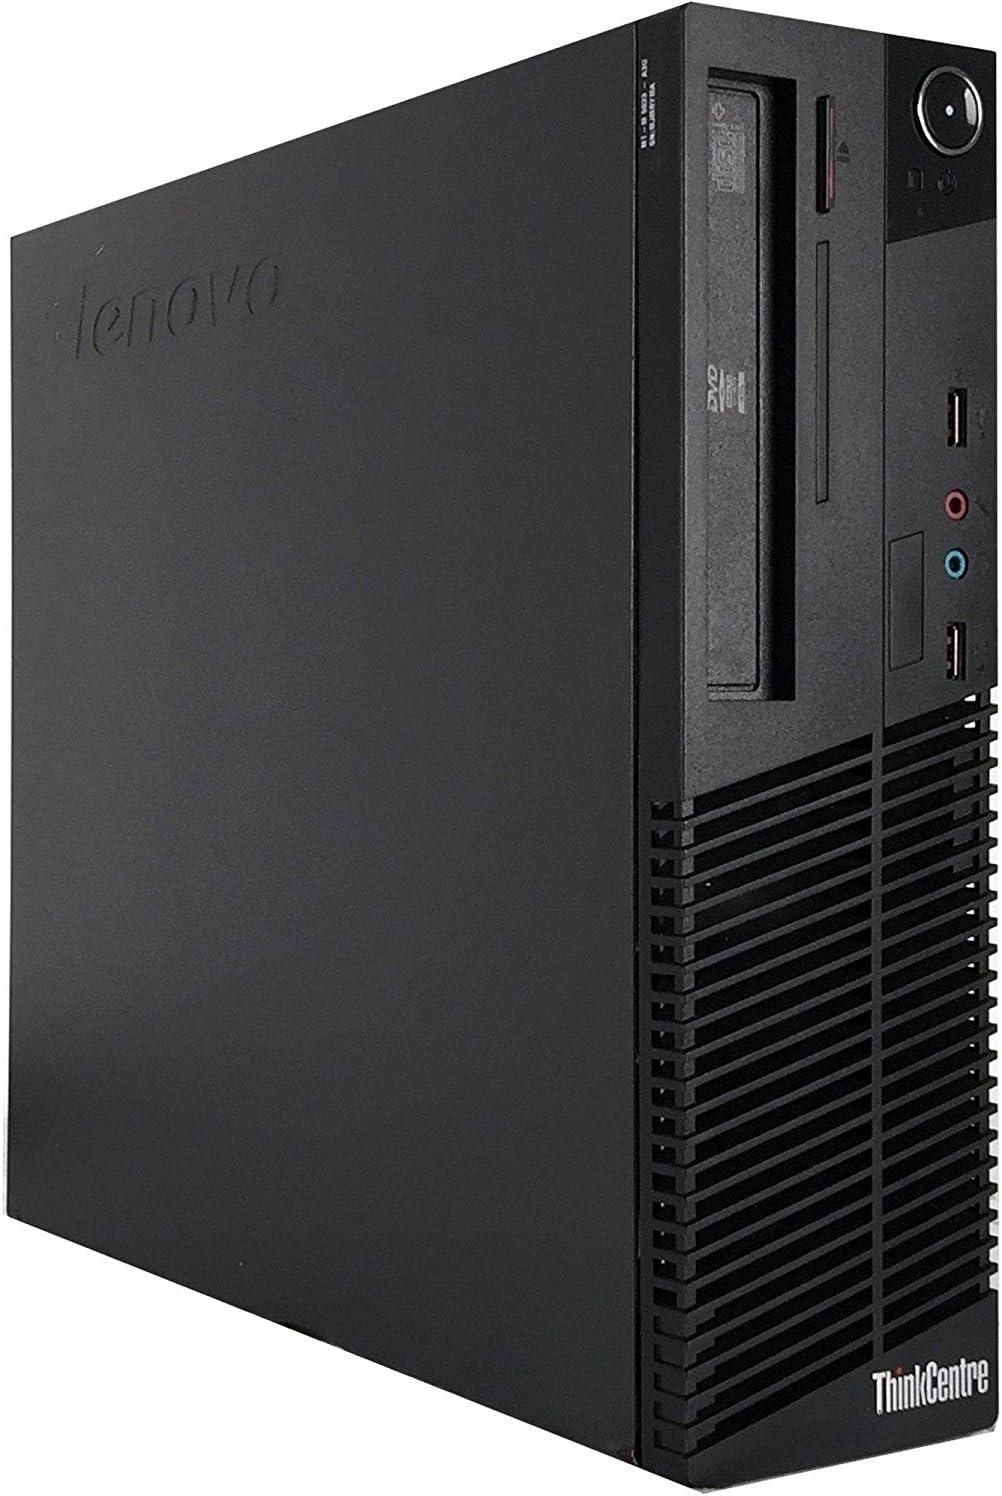 Lenovo ThinkCentre M82 SFF Business Desktop Computer, Intel Core i5-3470 Quad-Core Processor 3.6GHz, 16GB RAM, 2TB HDD, DVD RW, USB, WIFI, Windows 10 Professional (Renewed)